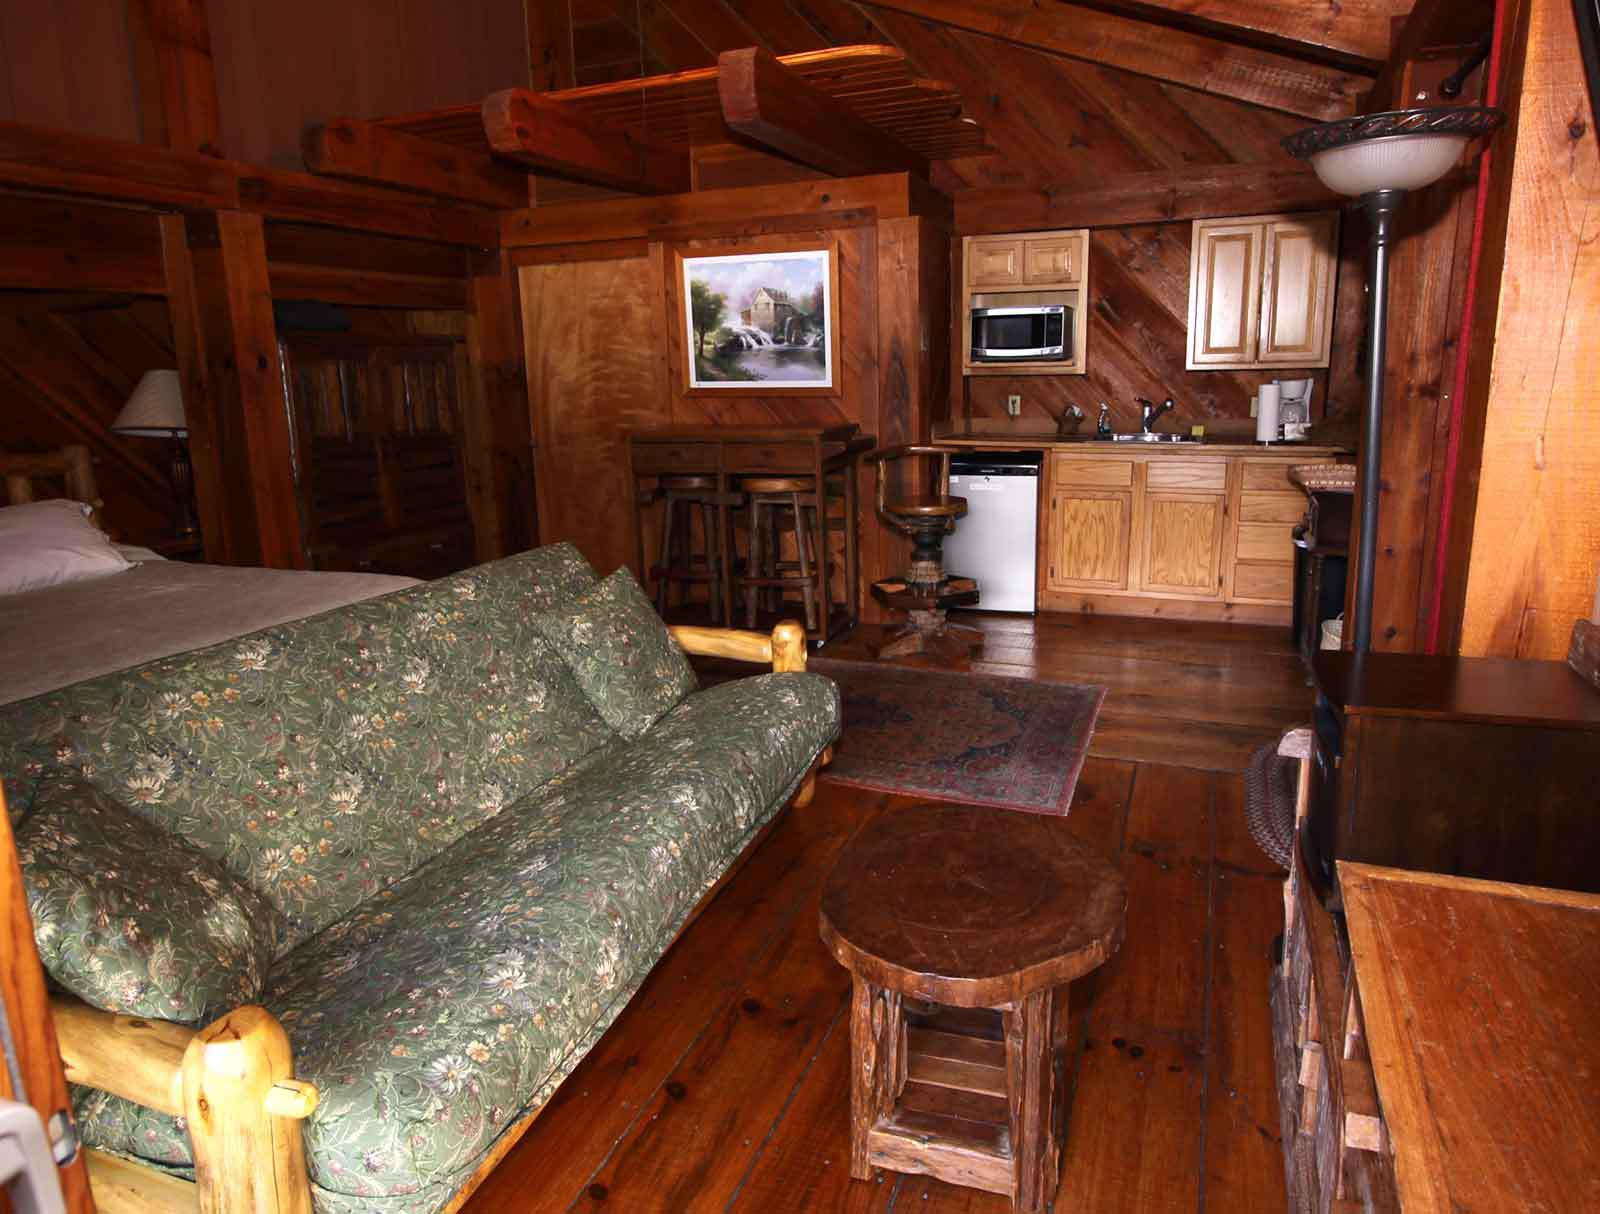 riverscape_sitting_area_kitchenette_futon_couch_web.jpg